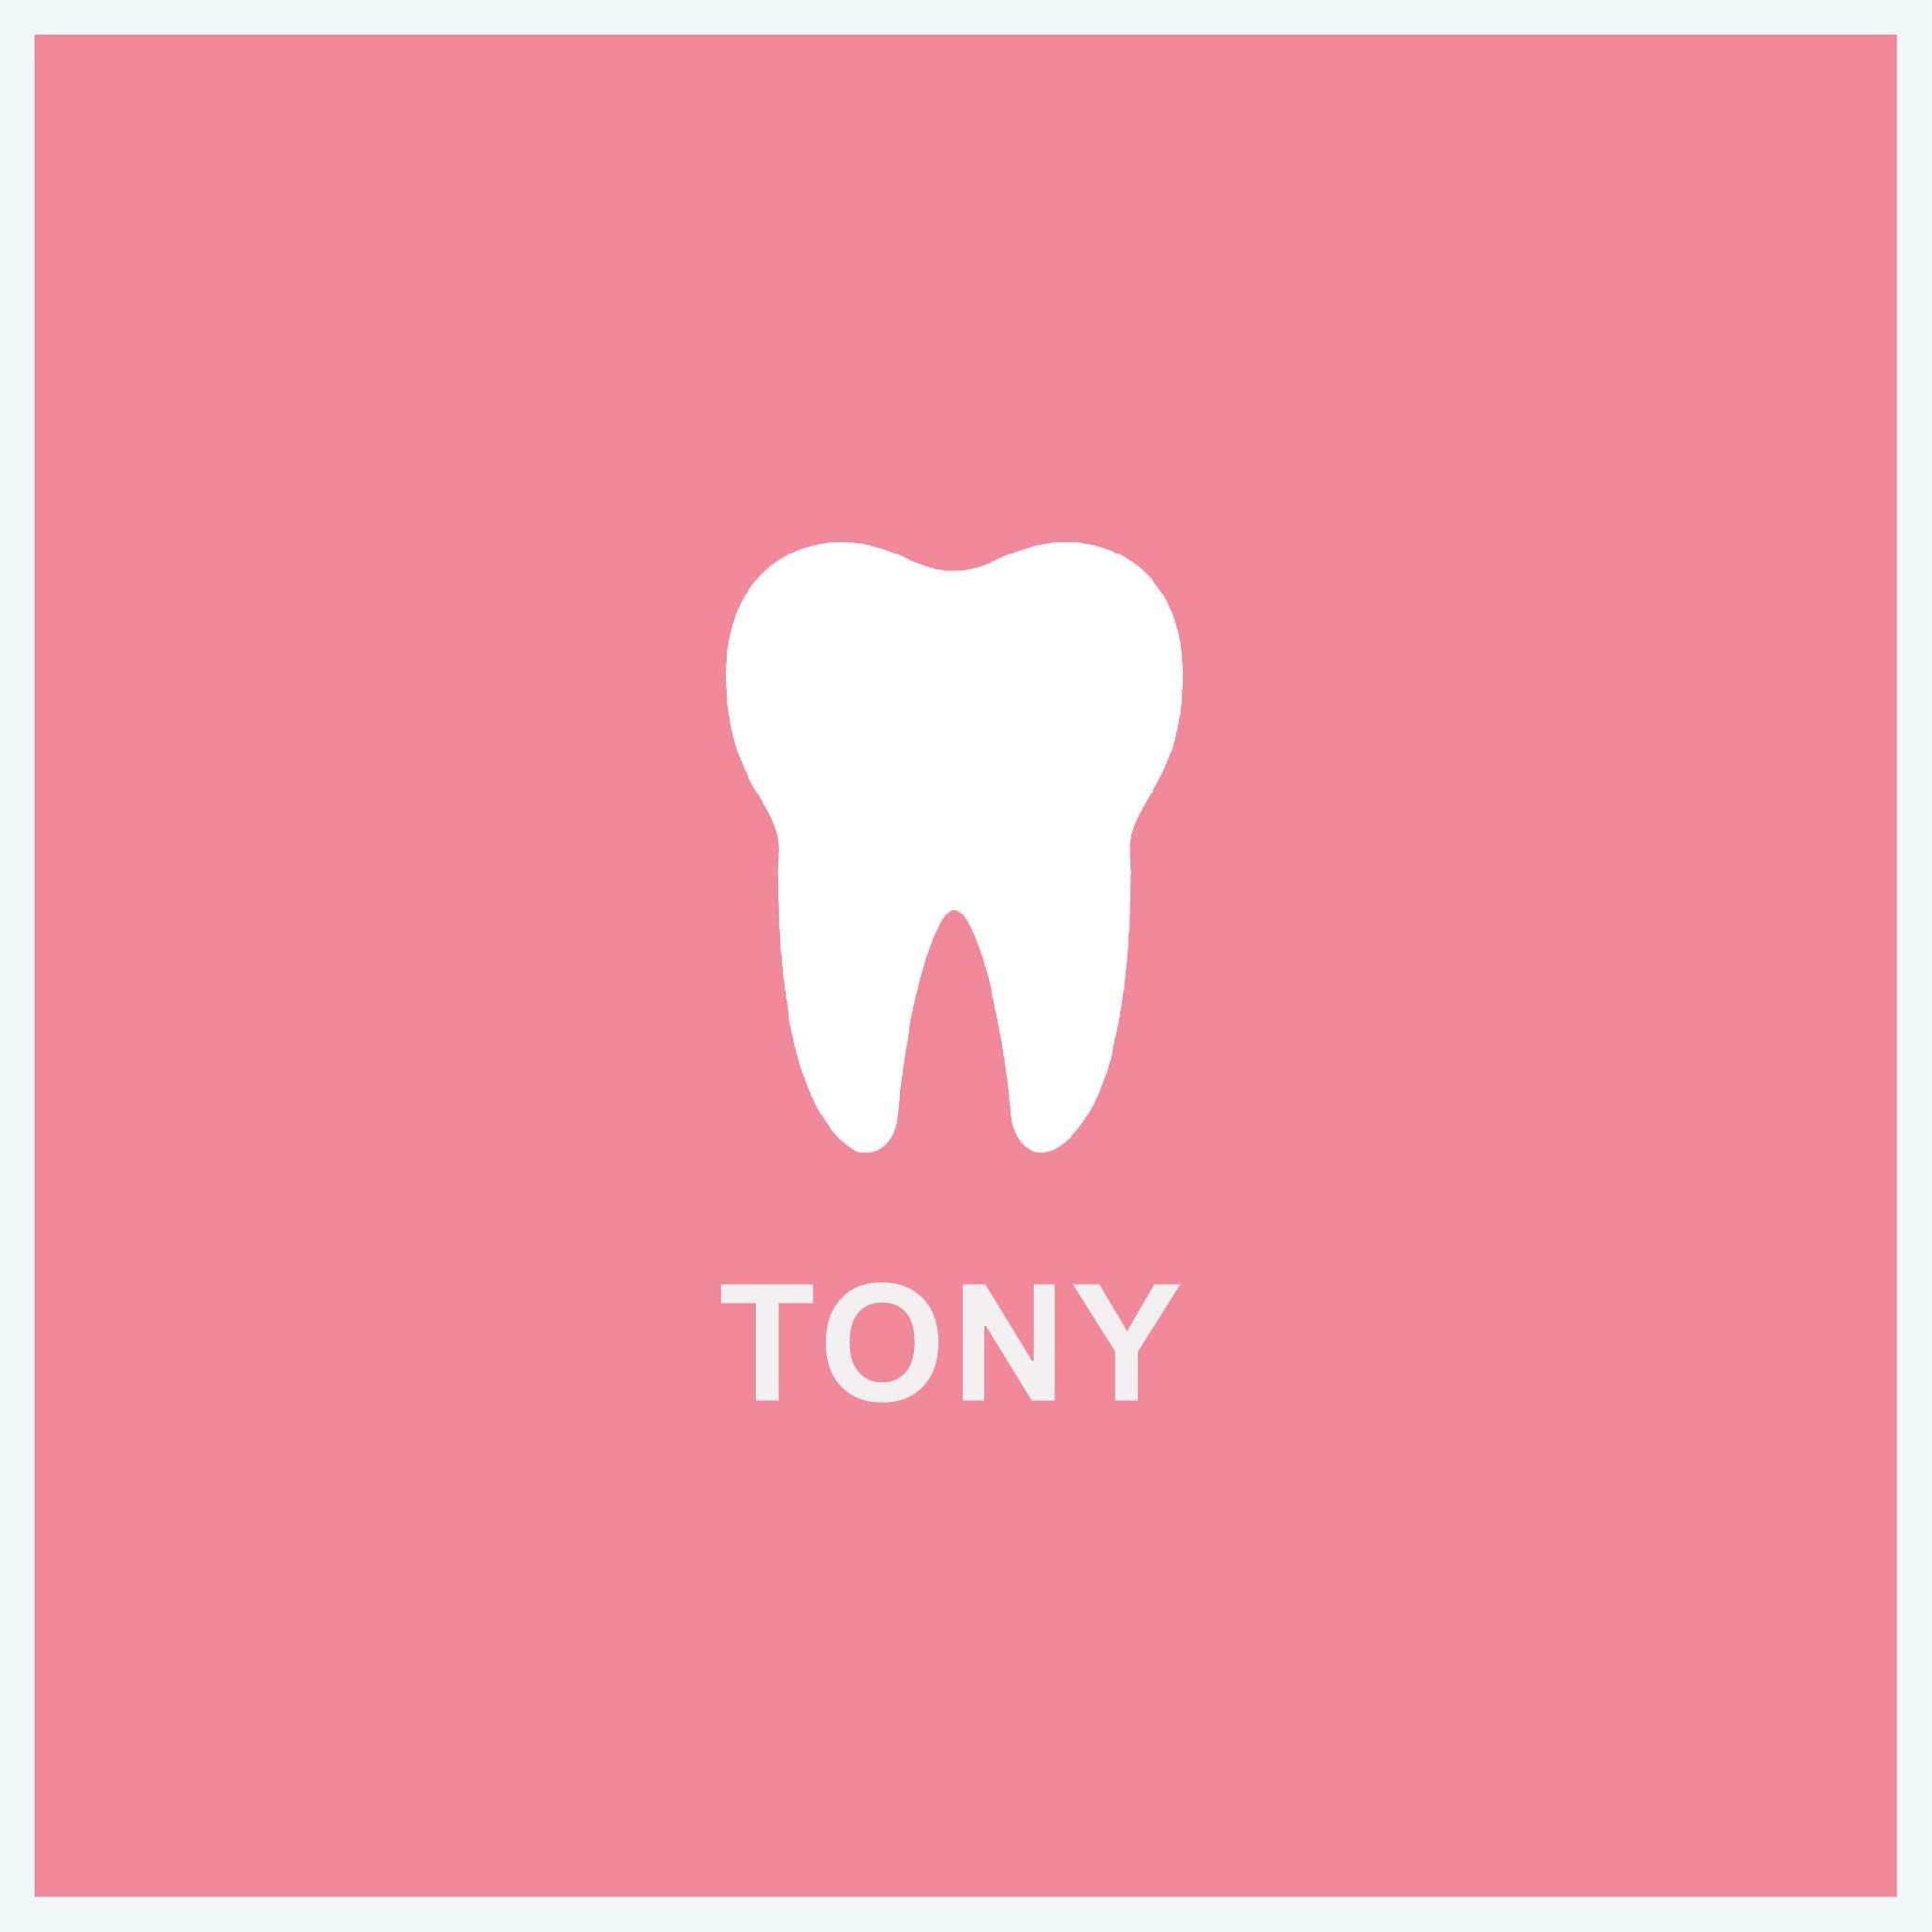 TONY牙醫隨寫